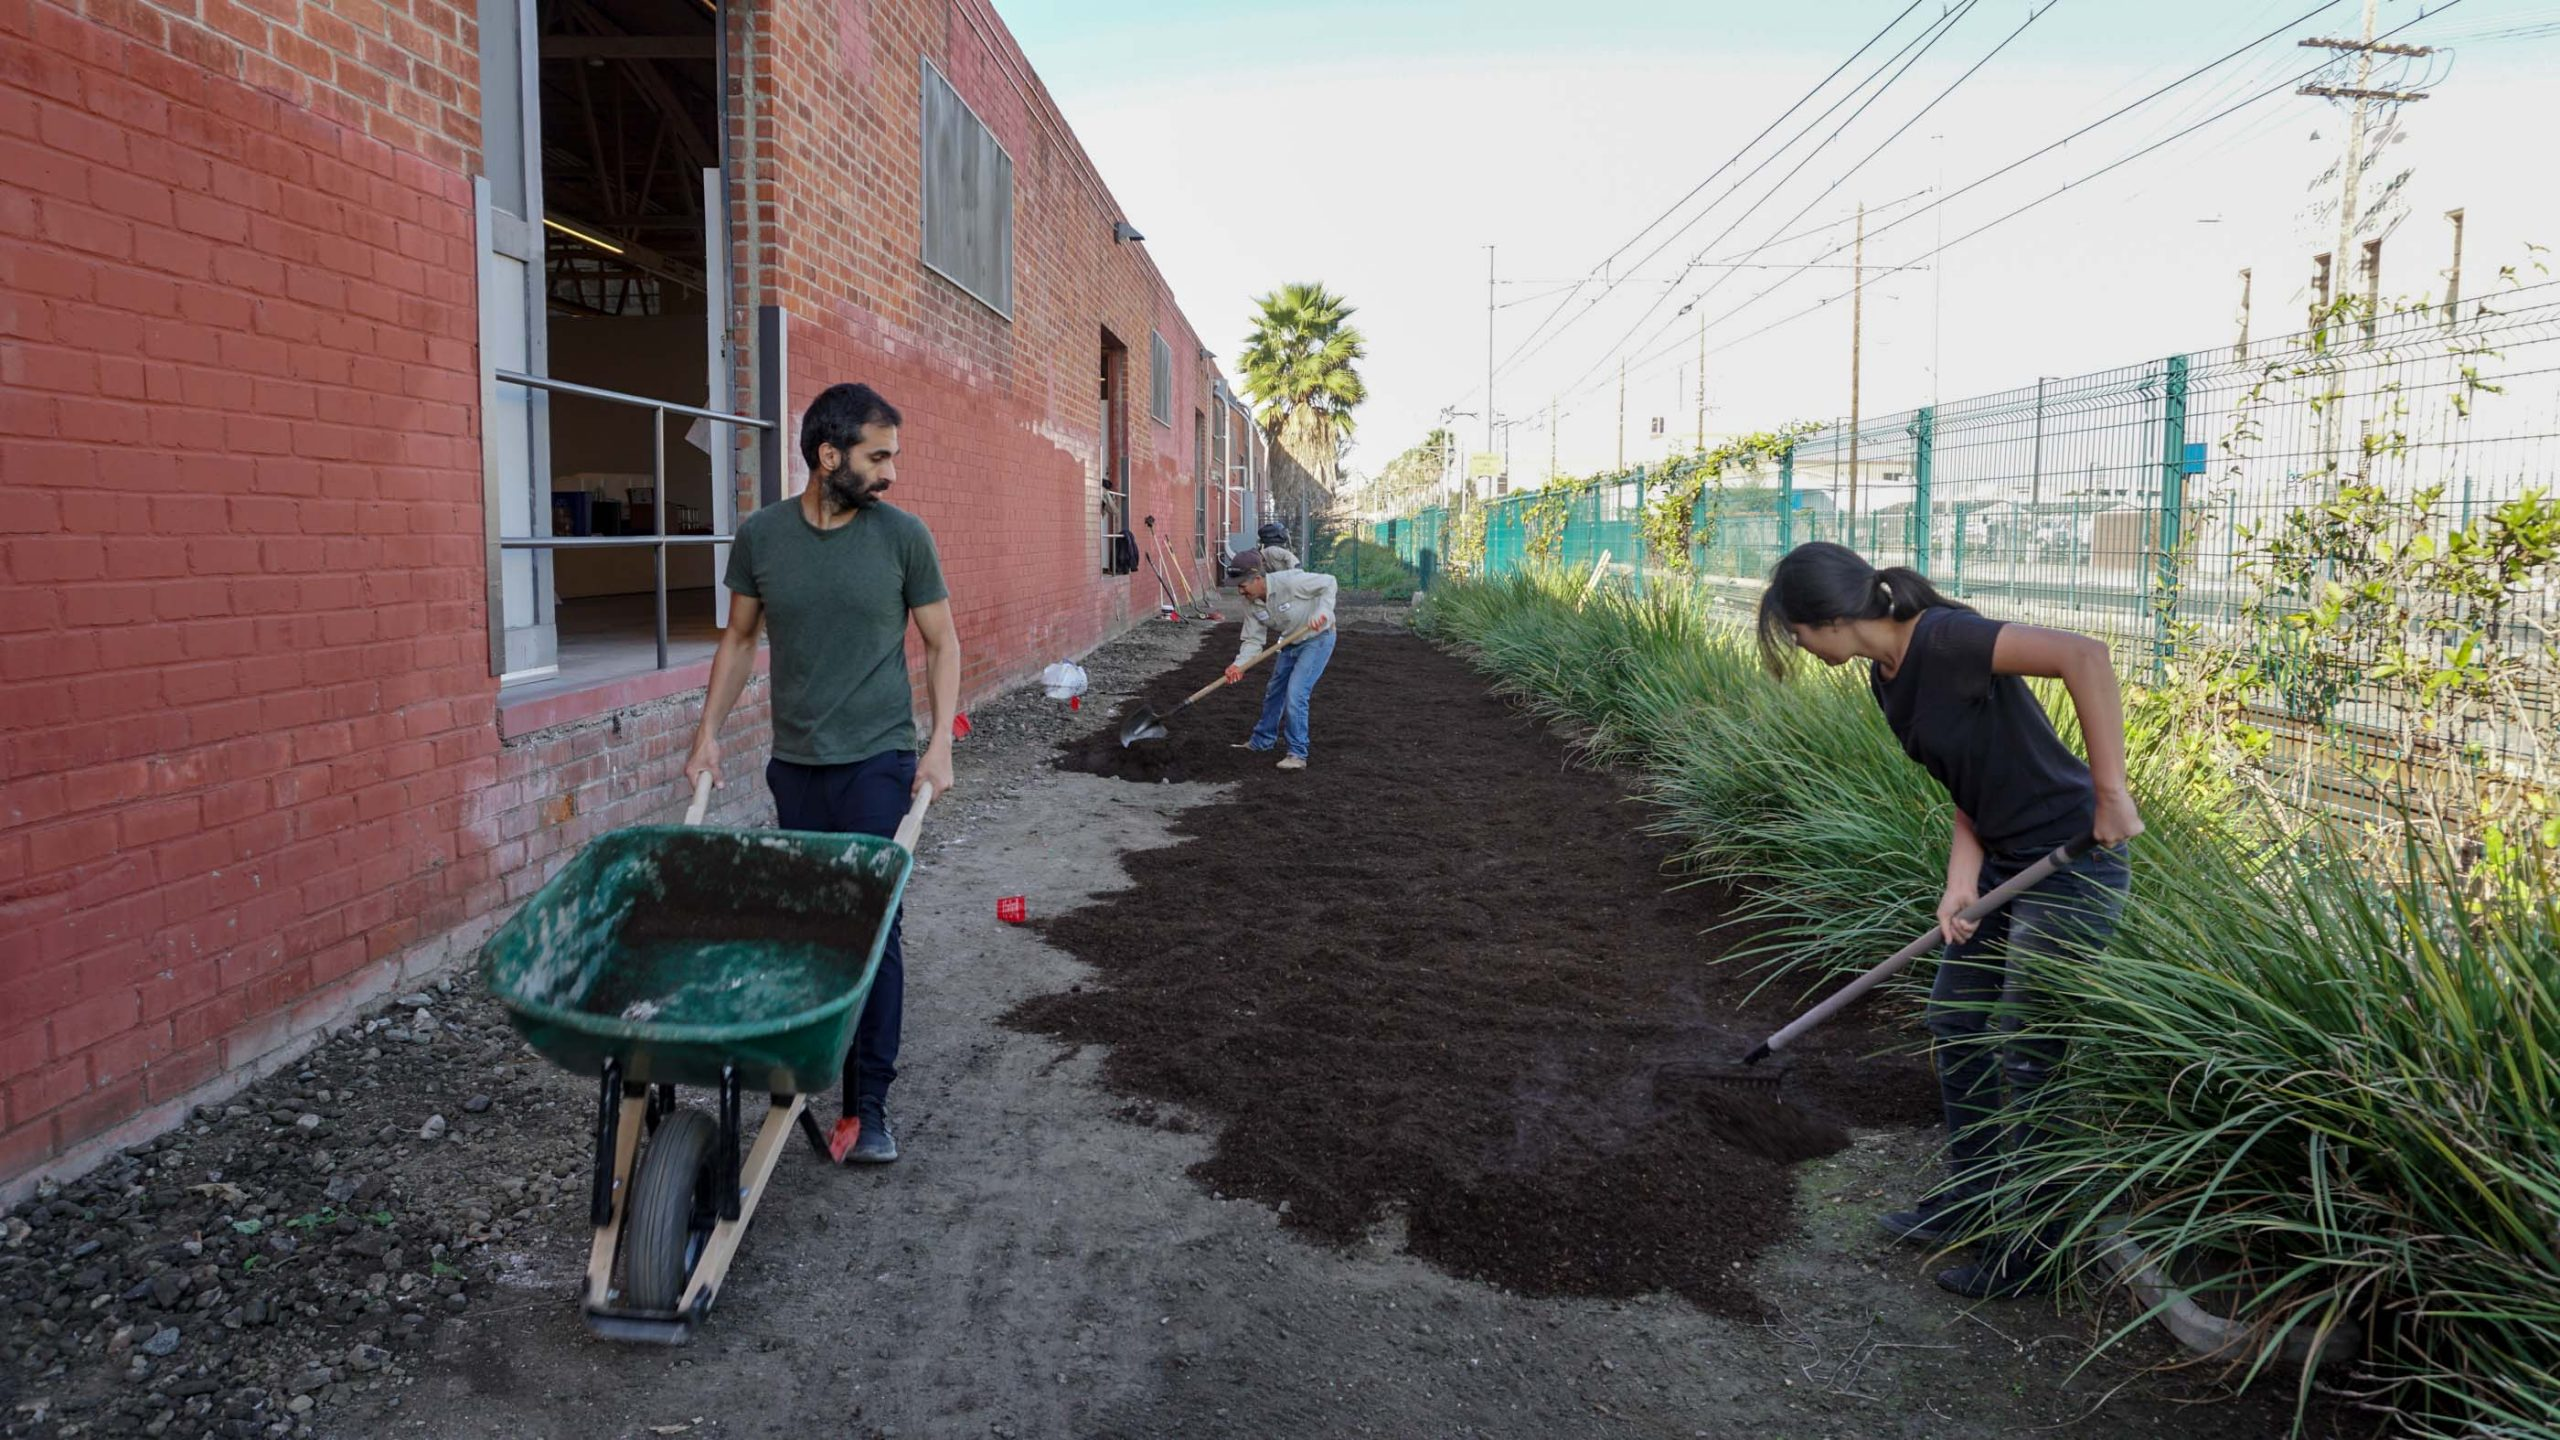 man with wheel barrow and woman raking soil